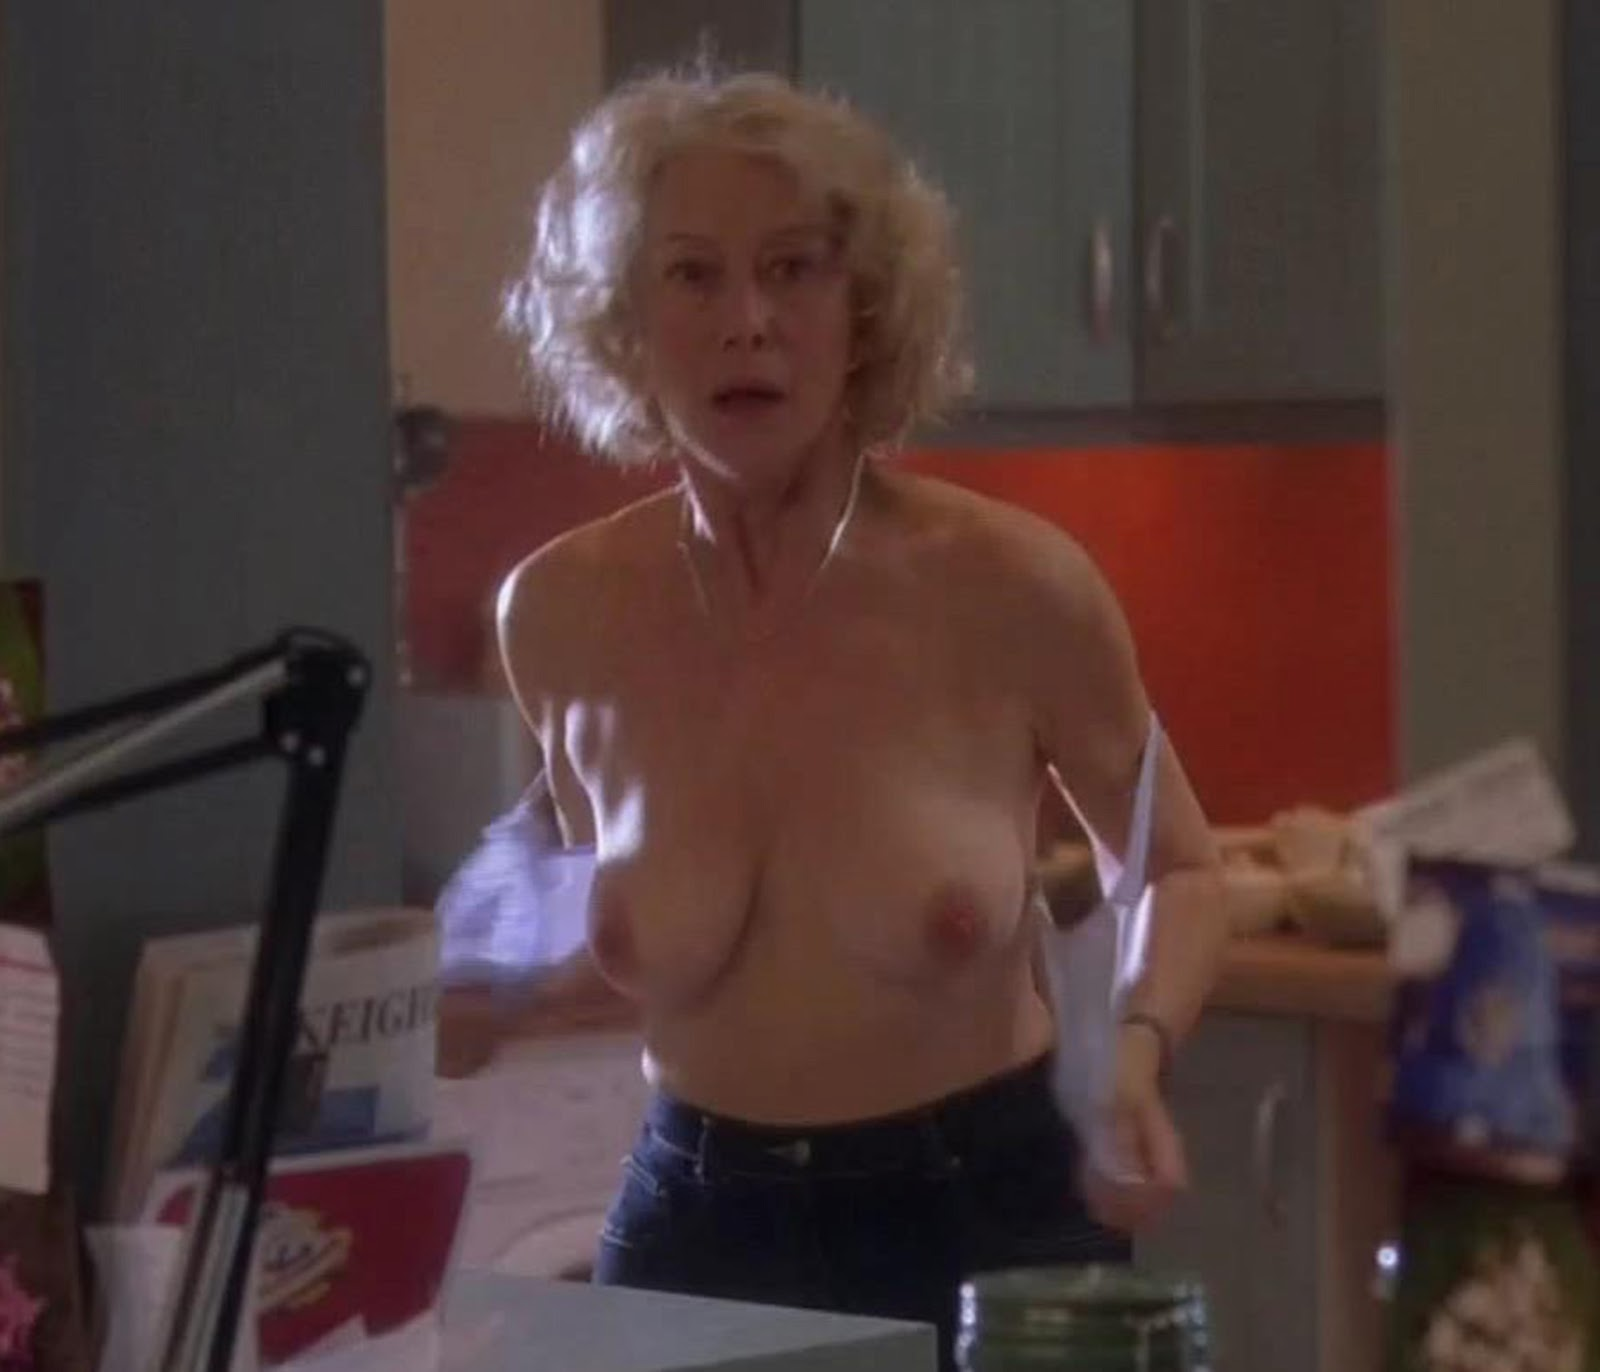 helen-mirren-topless-nude-naked-hardcore-latino-sex